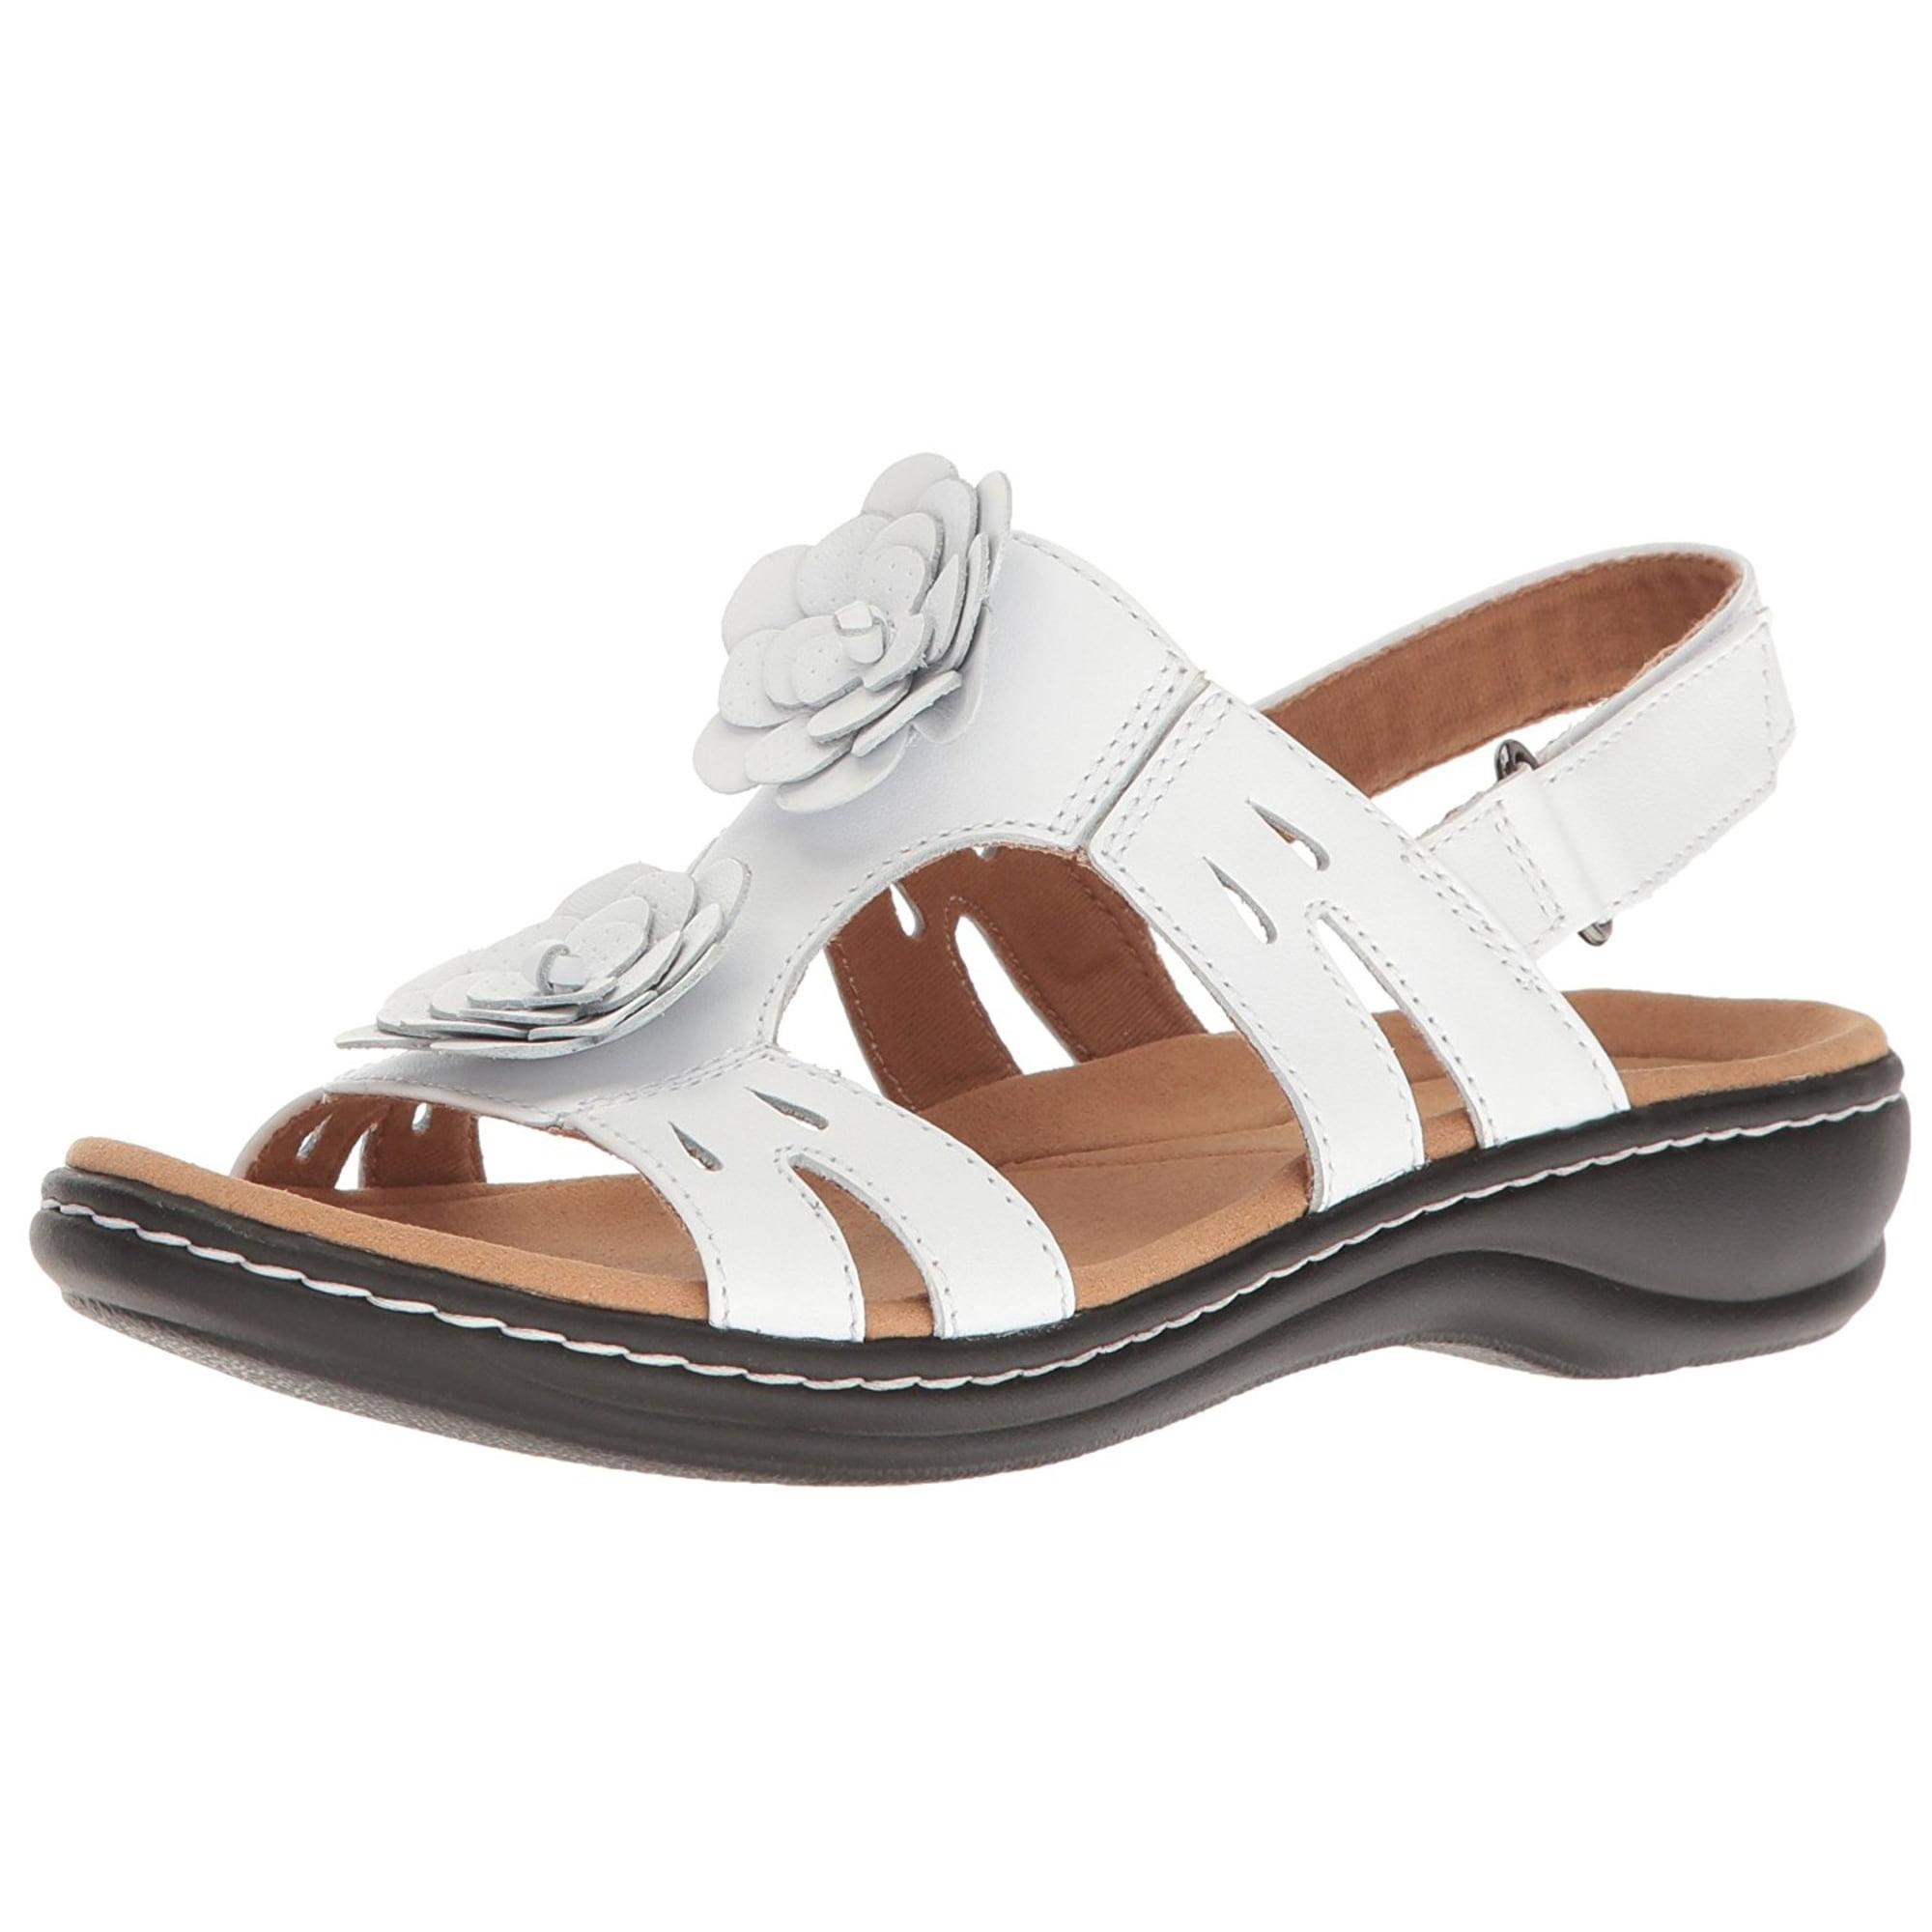 e6c3d9d4d50f CLARKS Women s Leisa Claytin Flat Sandal